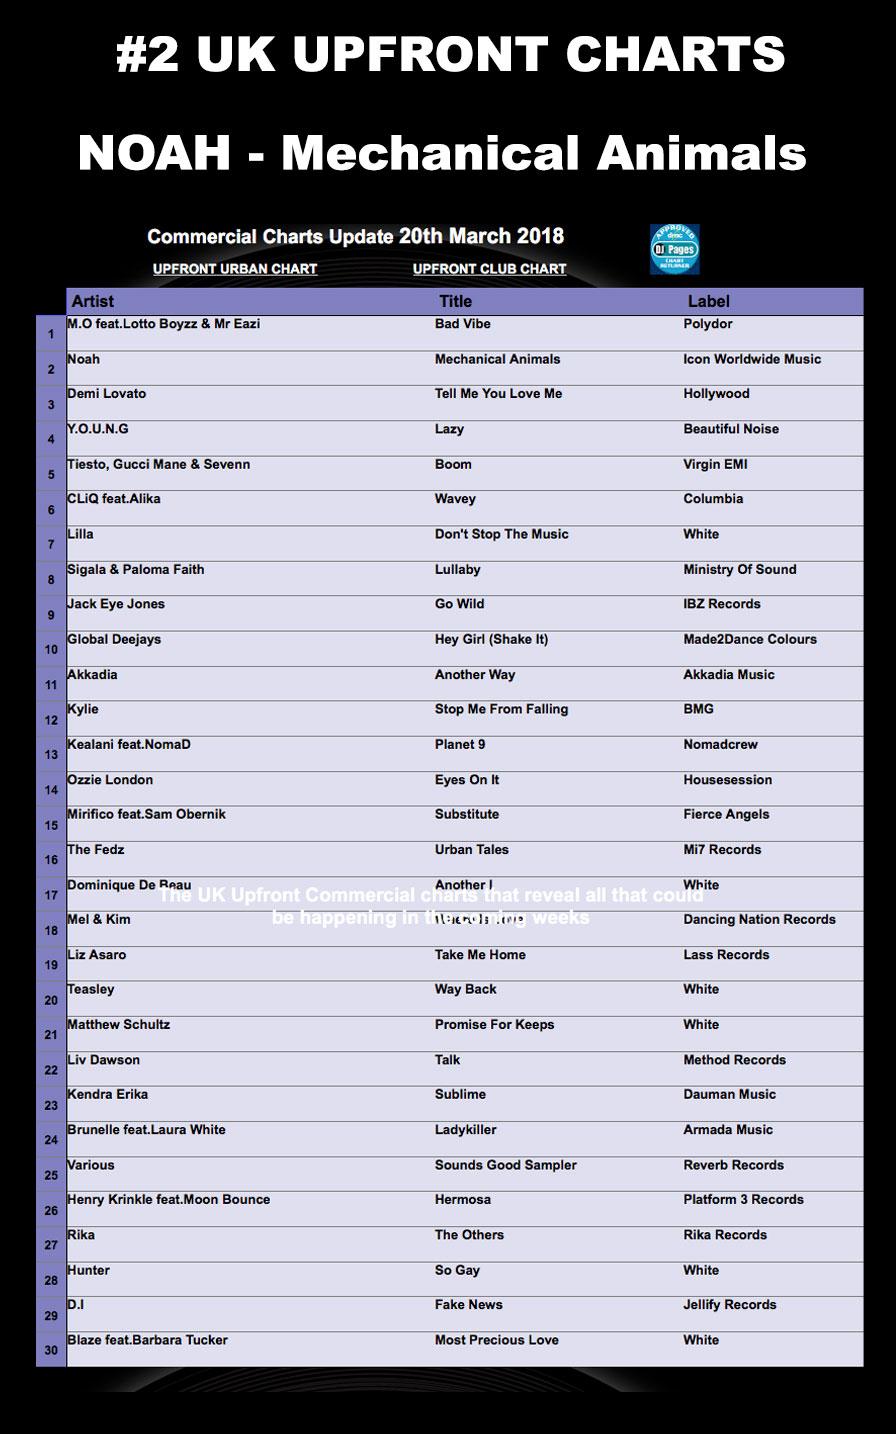 #2-UK-Upfront-Charts.jpg